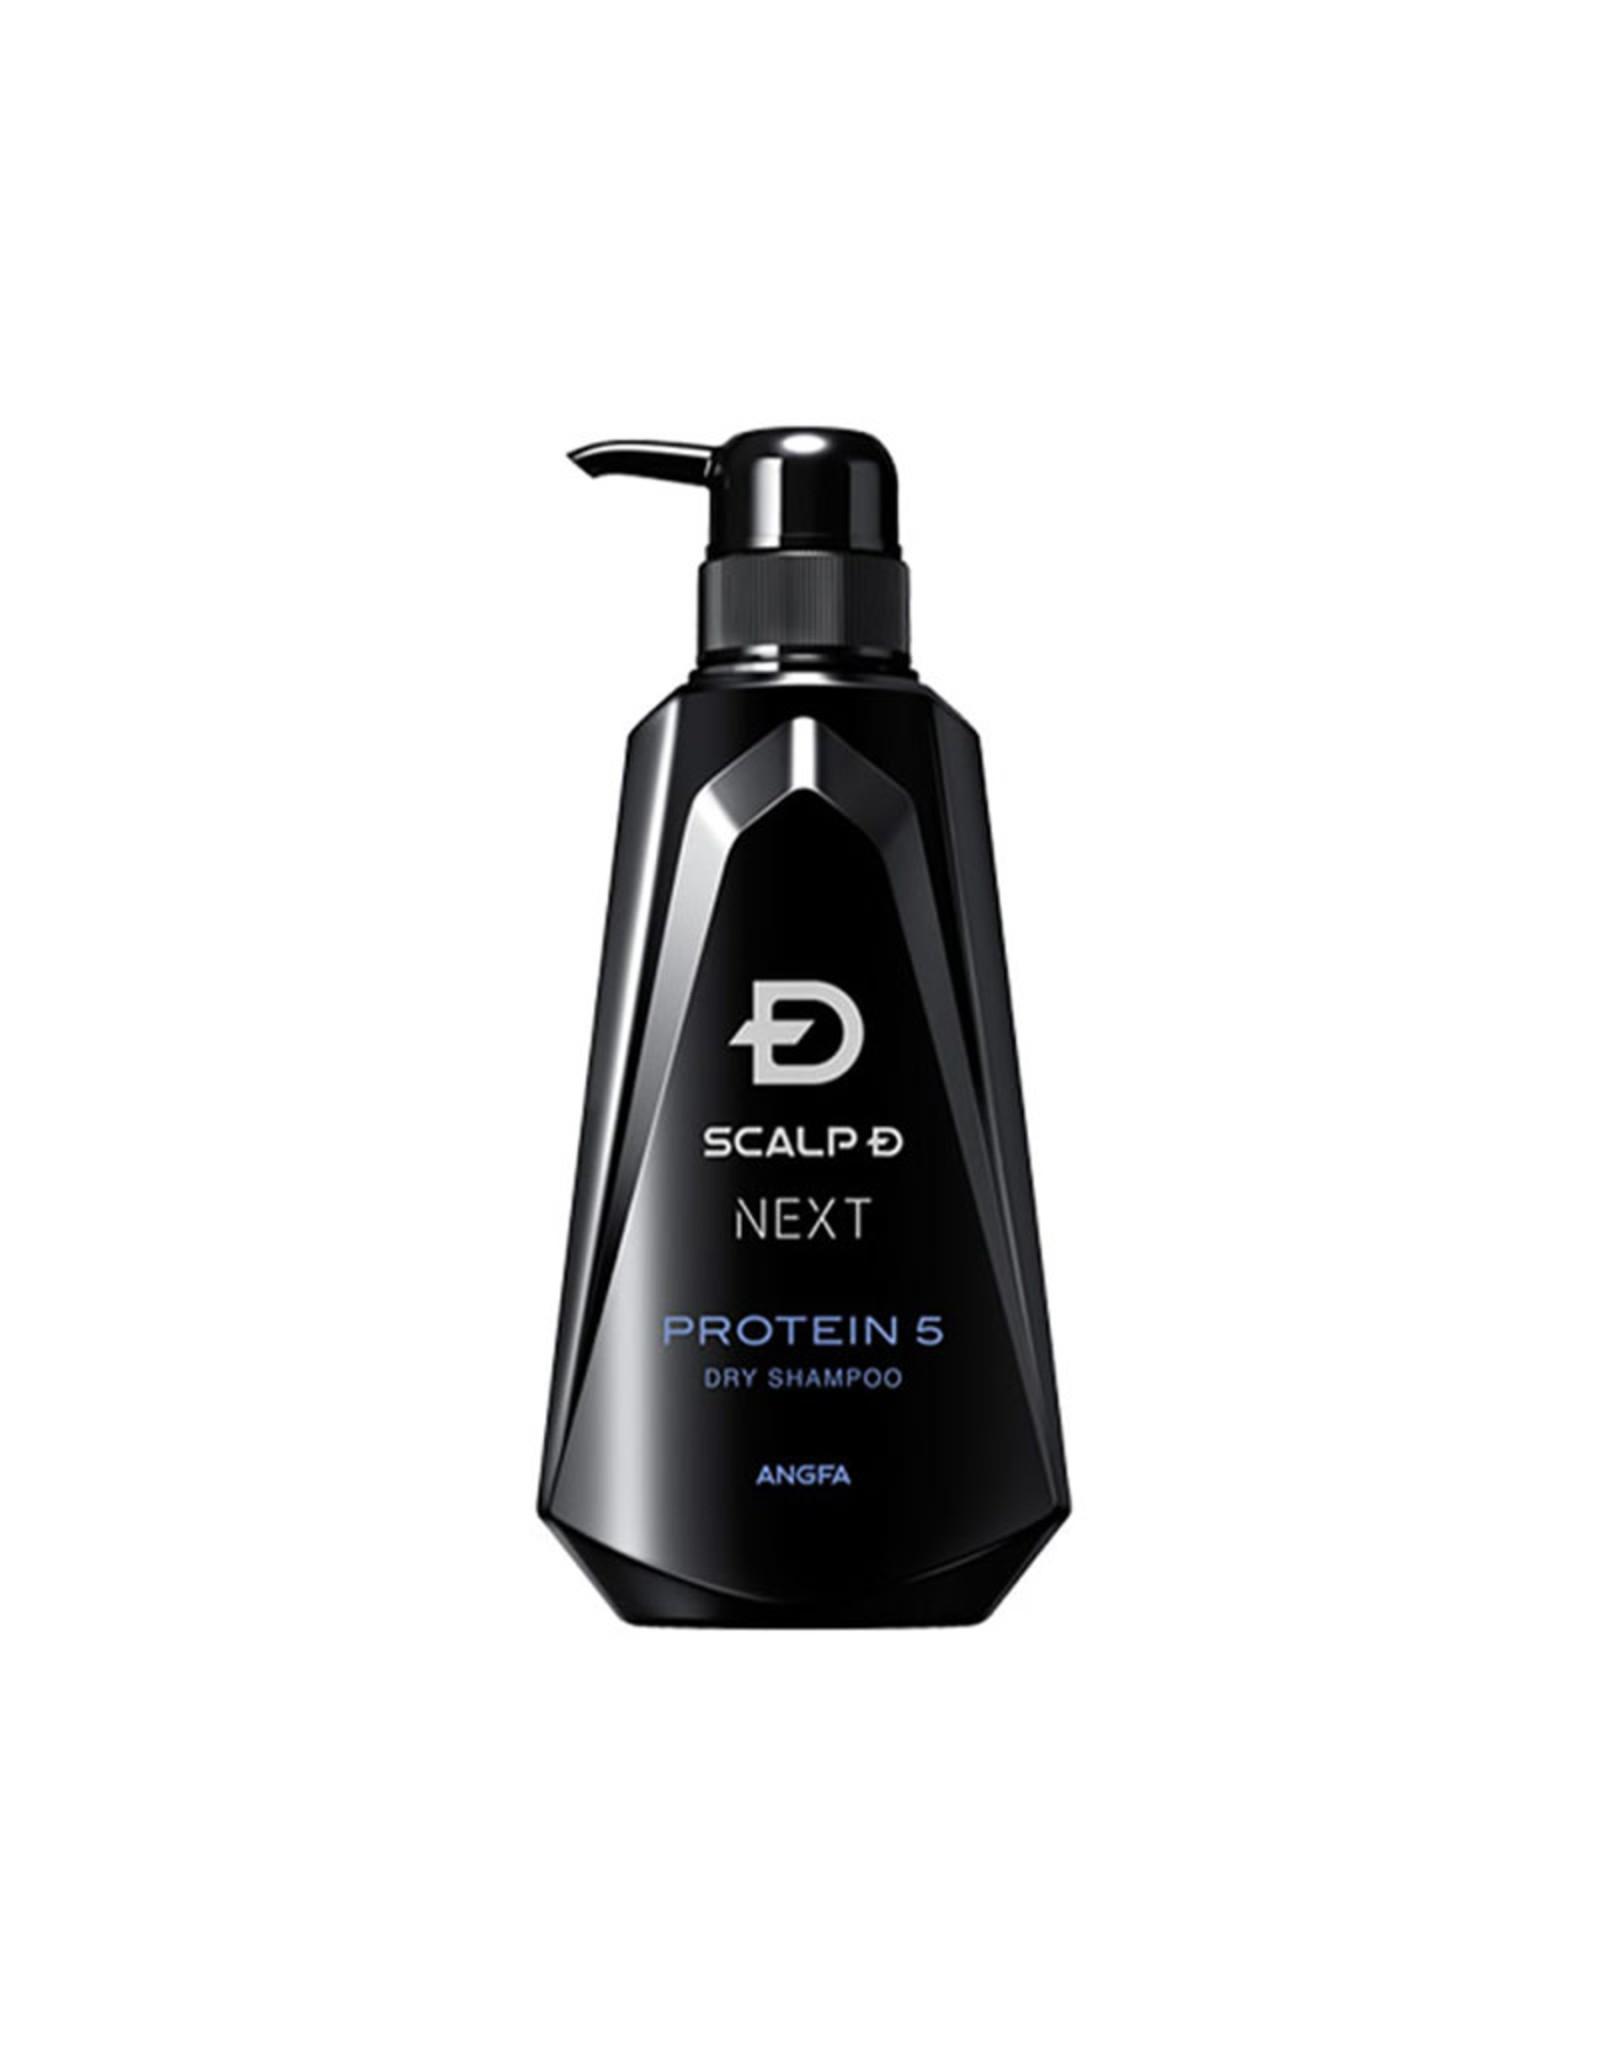 Angfa ANGFA Scalp D Next Protein 5 Shampoo Dry